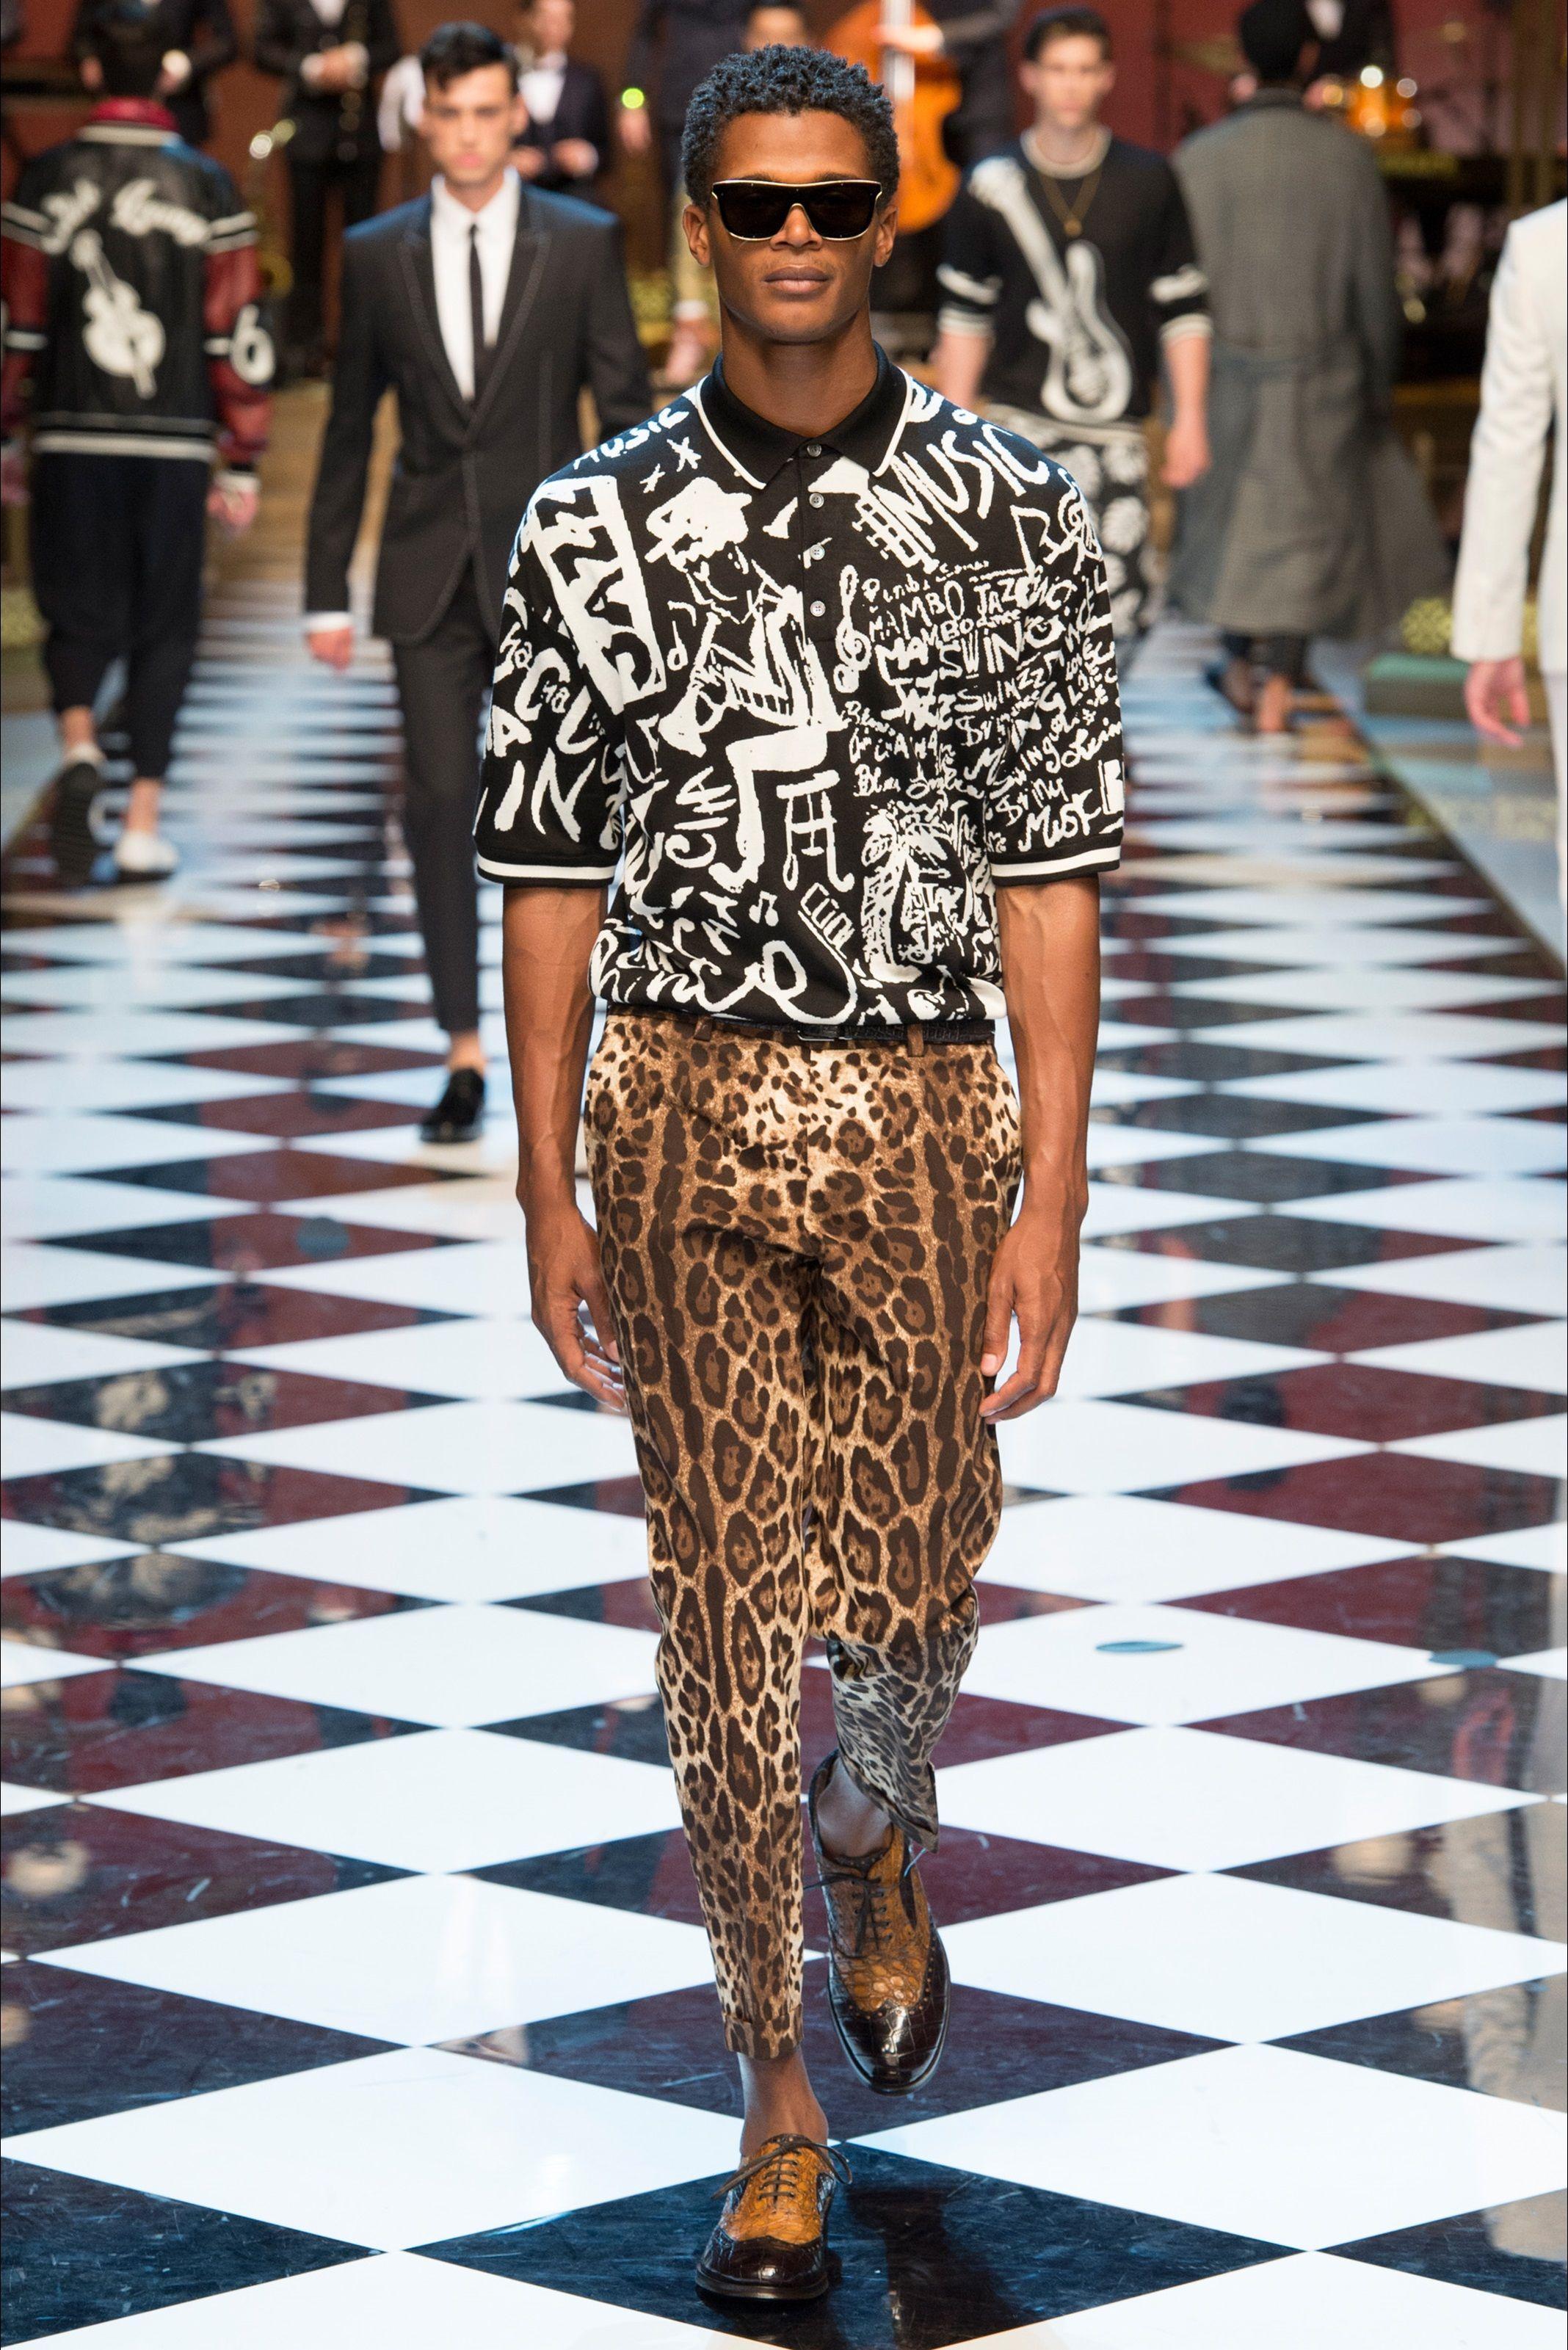 Sfilata Moda Uomo Dolce   Gabbana Milano - Primavera Estate 2017 - Vogue Moda  Uomo 97b1813ba43